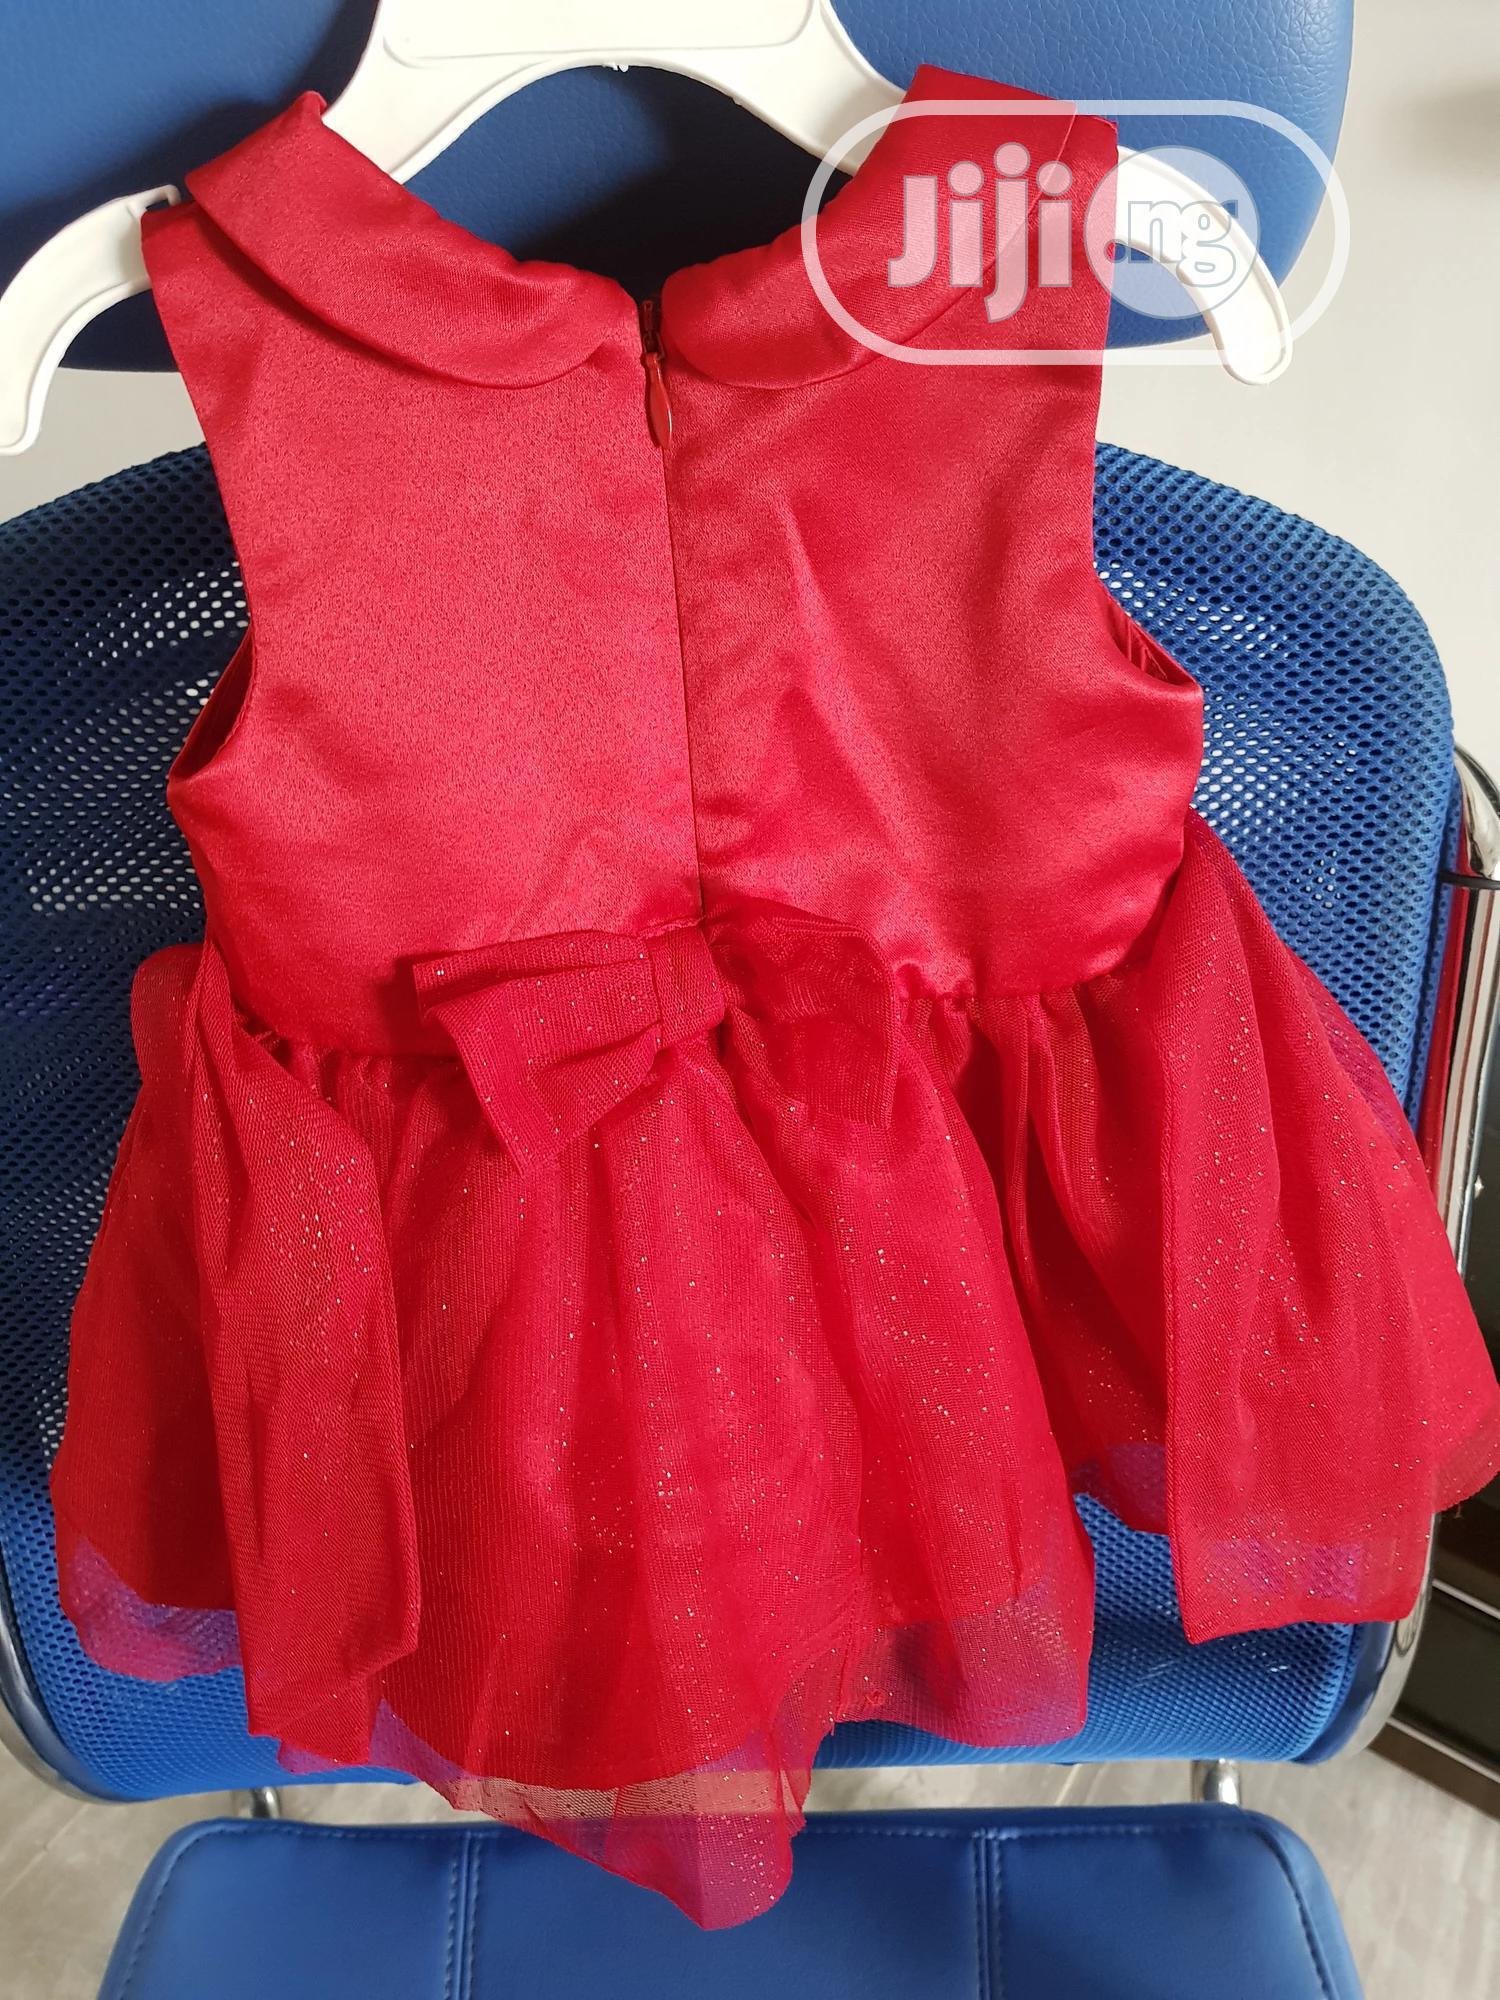 Next Dress for Girls